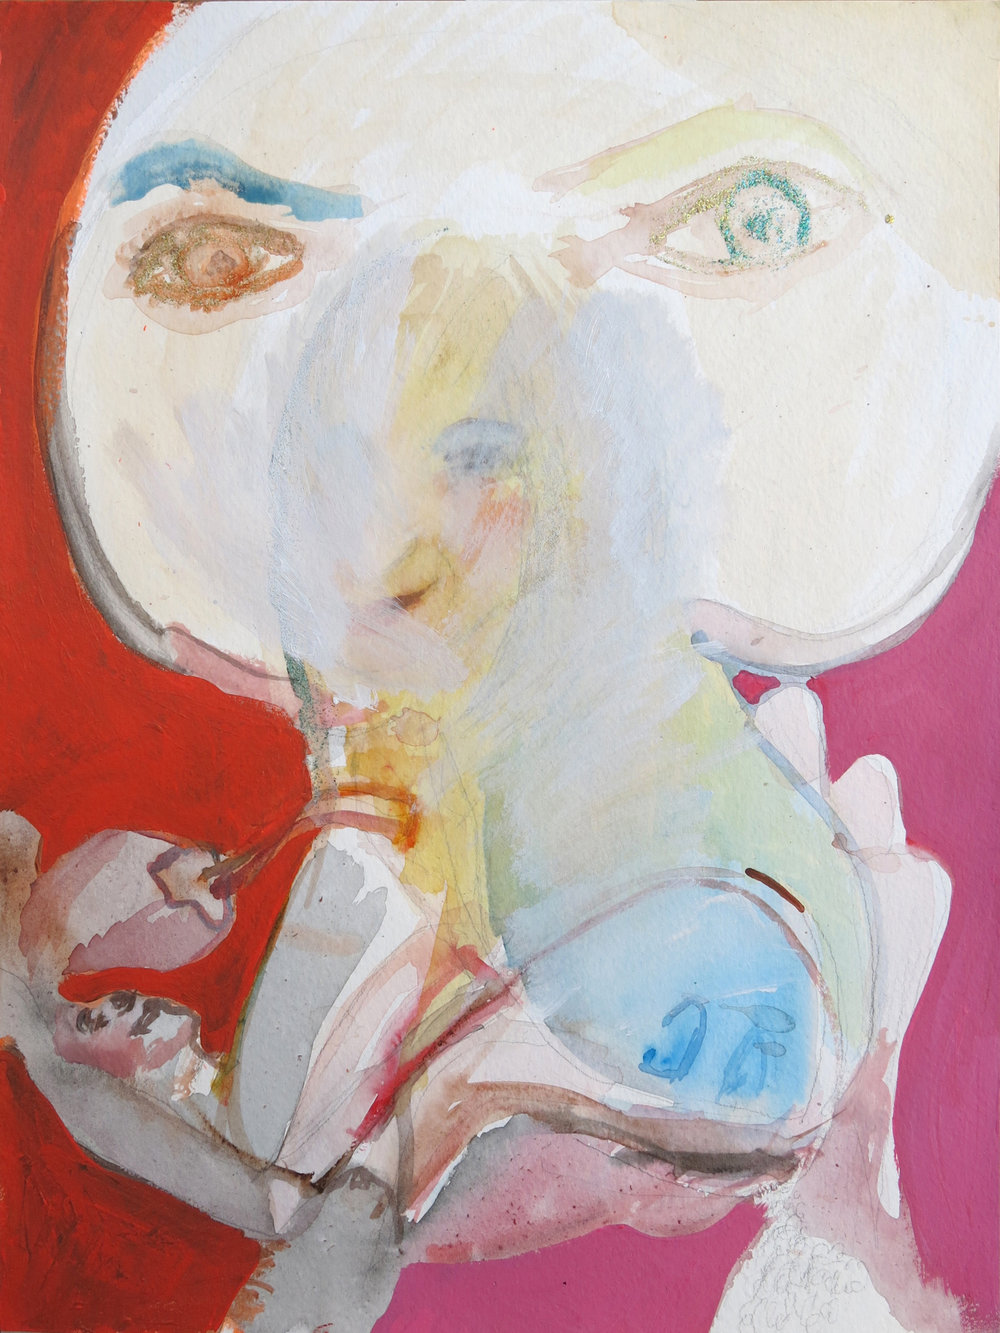 Barbra Streisand Portrait #151